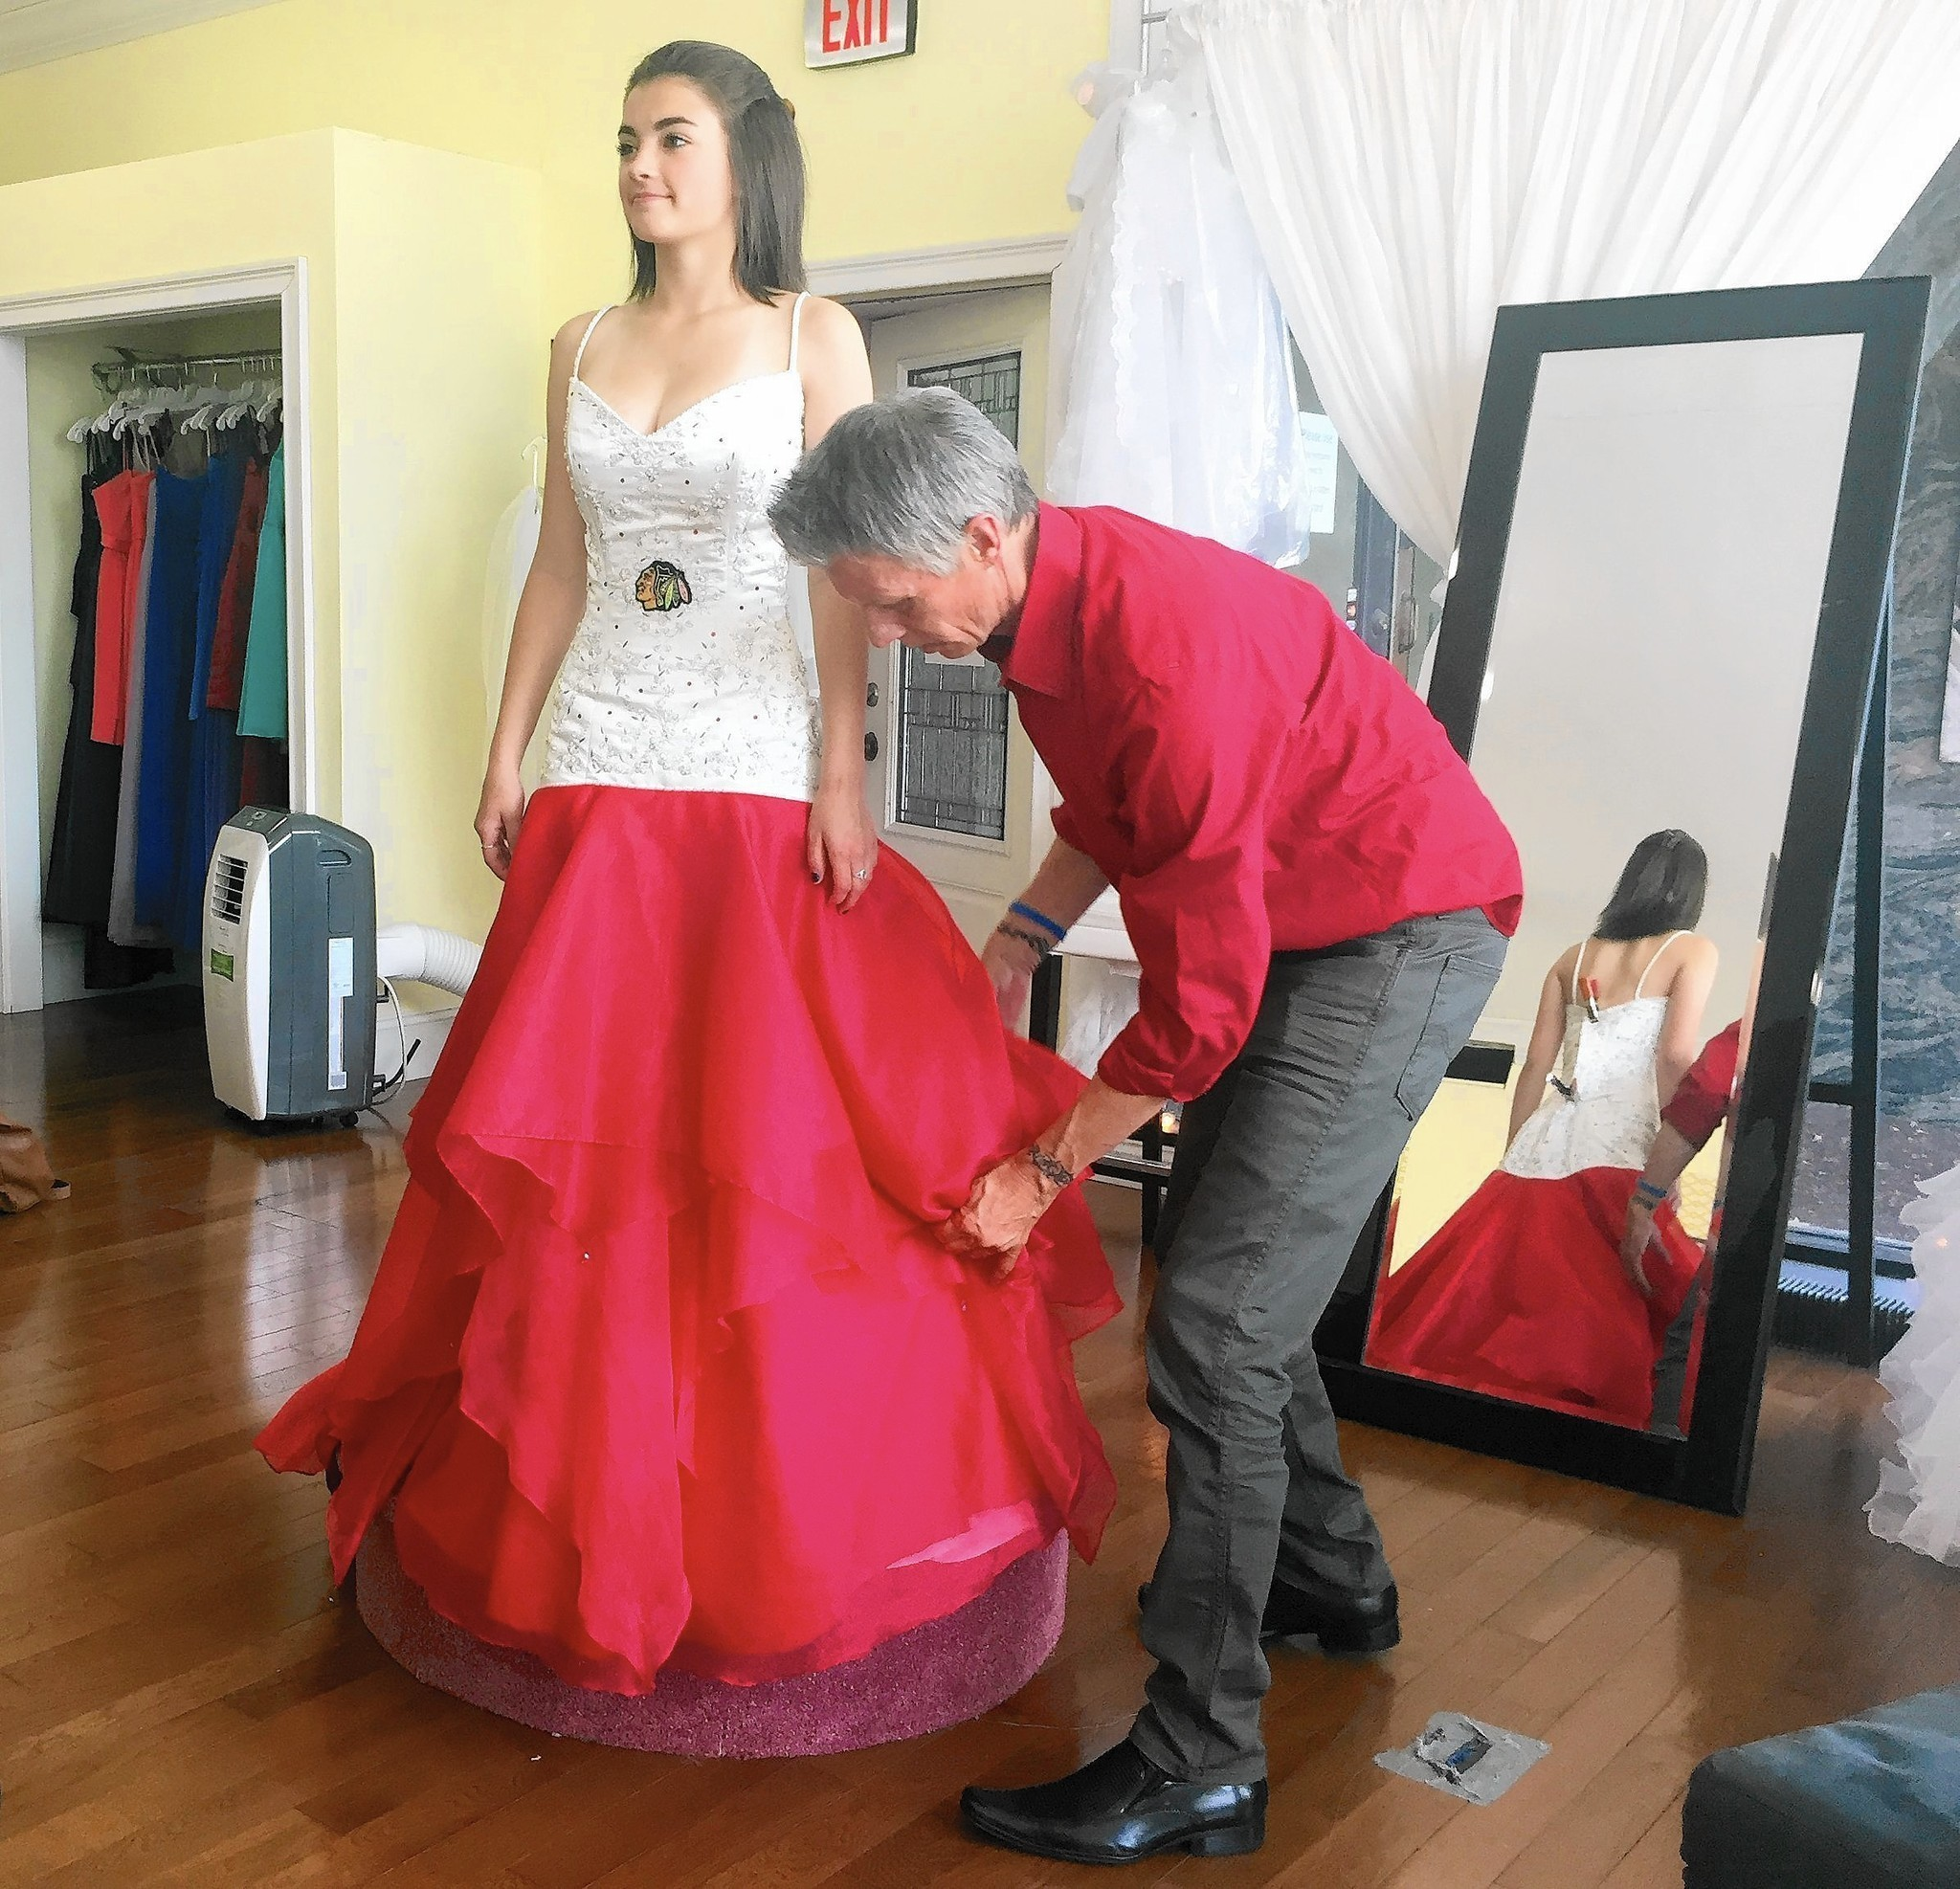 sale retailer e9d66 41c78 Designer creating new dress for Hawk fan's wedding by the ...